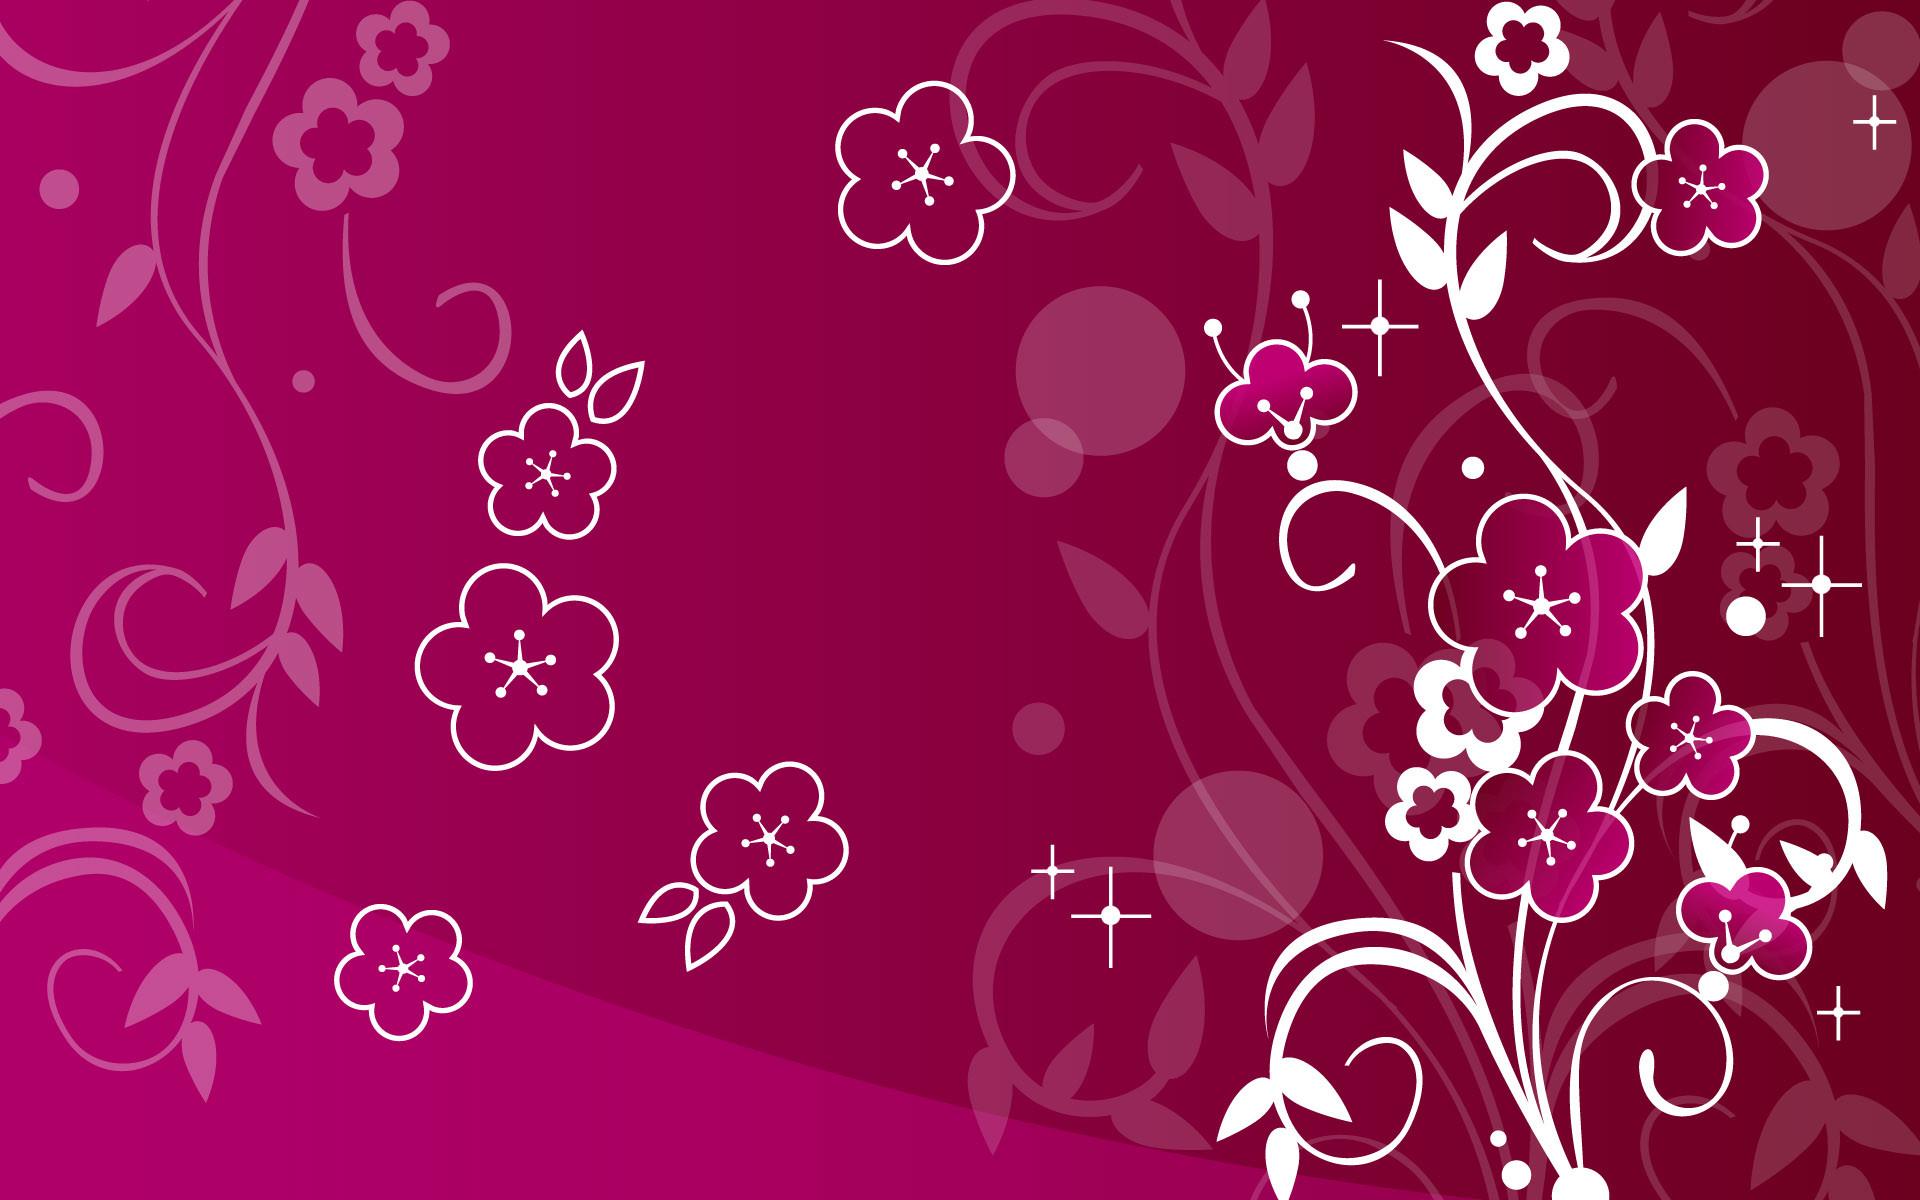 Purple Flowers Vector HD desktop wallpaper, Swirl wallpaper, Leaf wallpaper,  Petal wallpaper – Vector no.